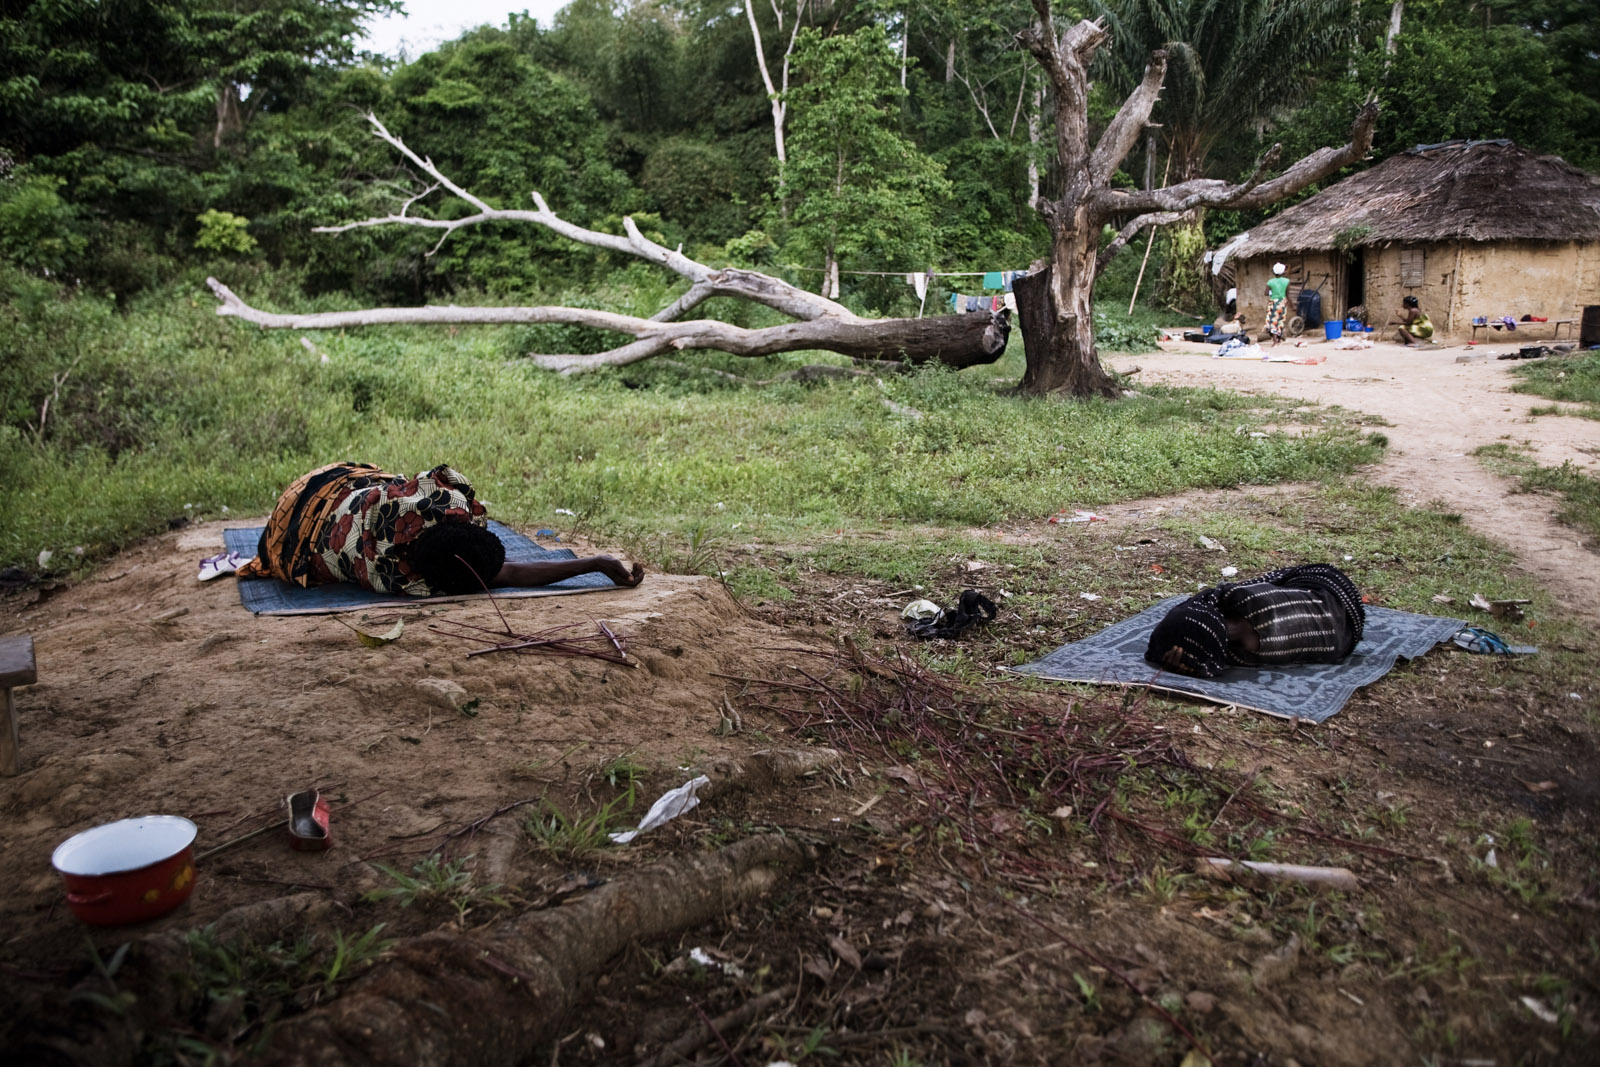 liberia-refugies-ivoiriens-0311-0554hd